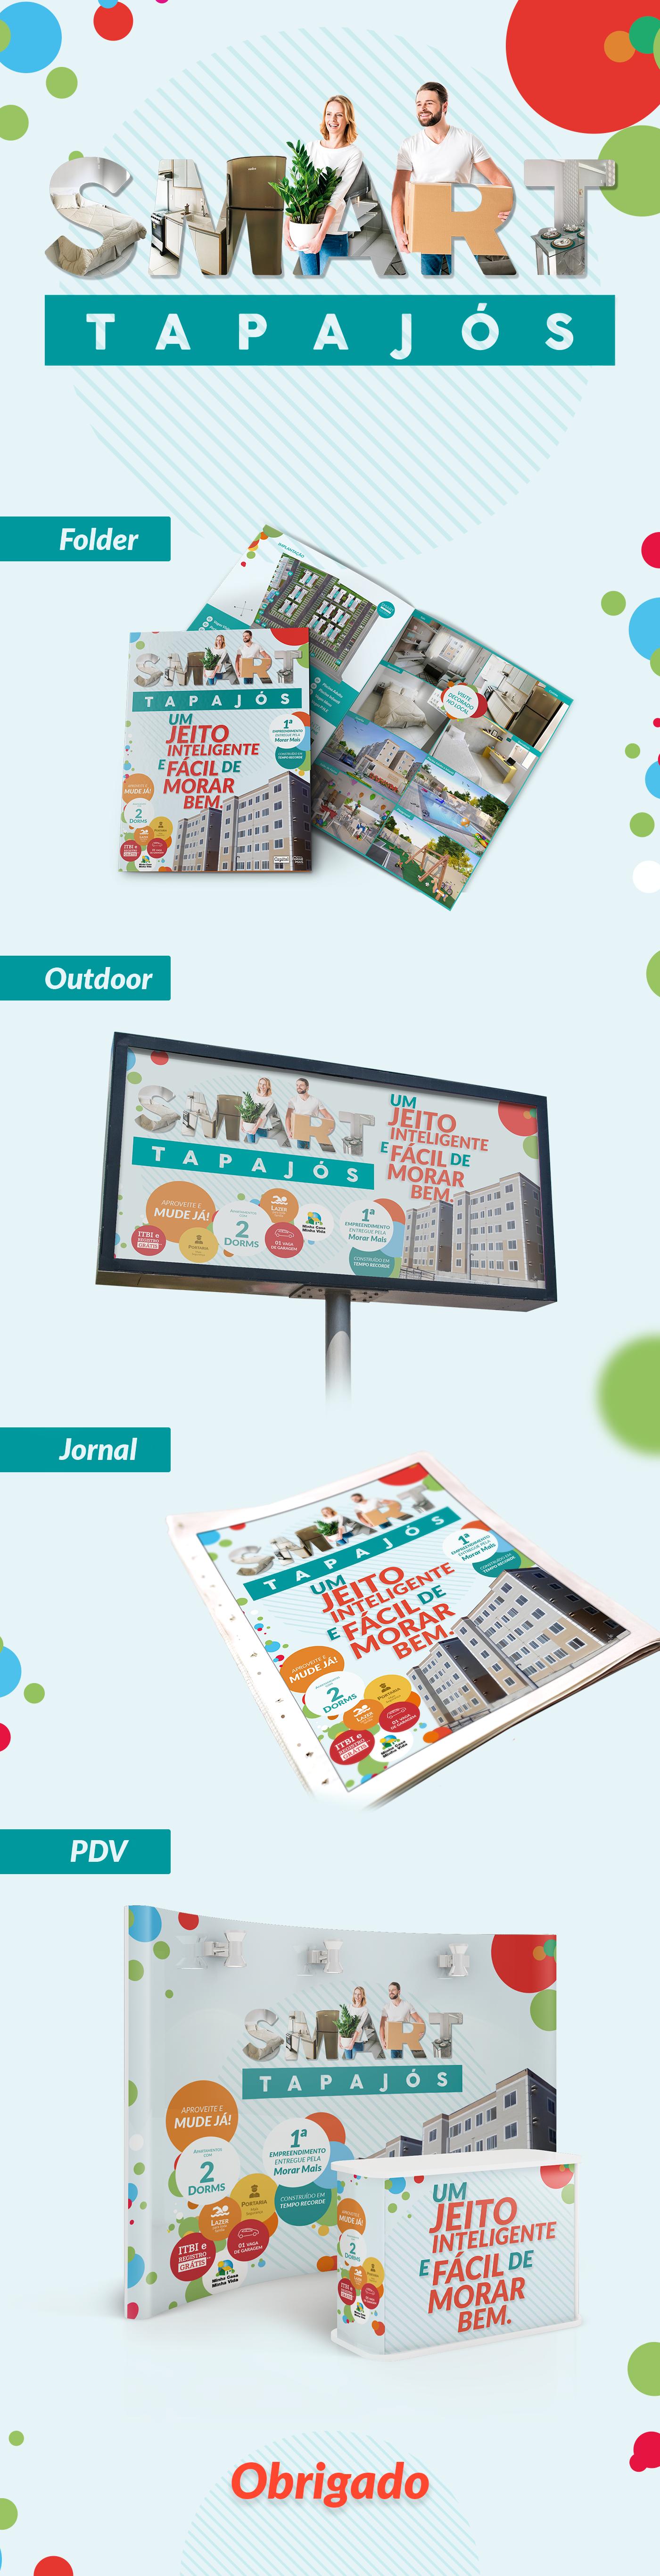 Smart MorarMais Smart Tapajós LBz.agency campaign Advertising  campanha